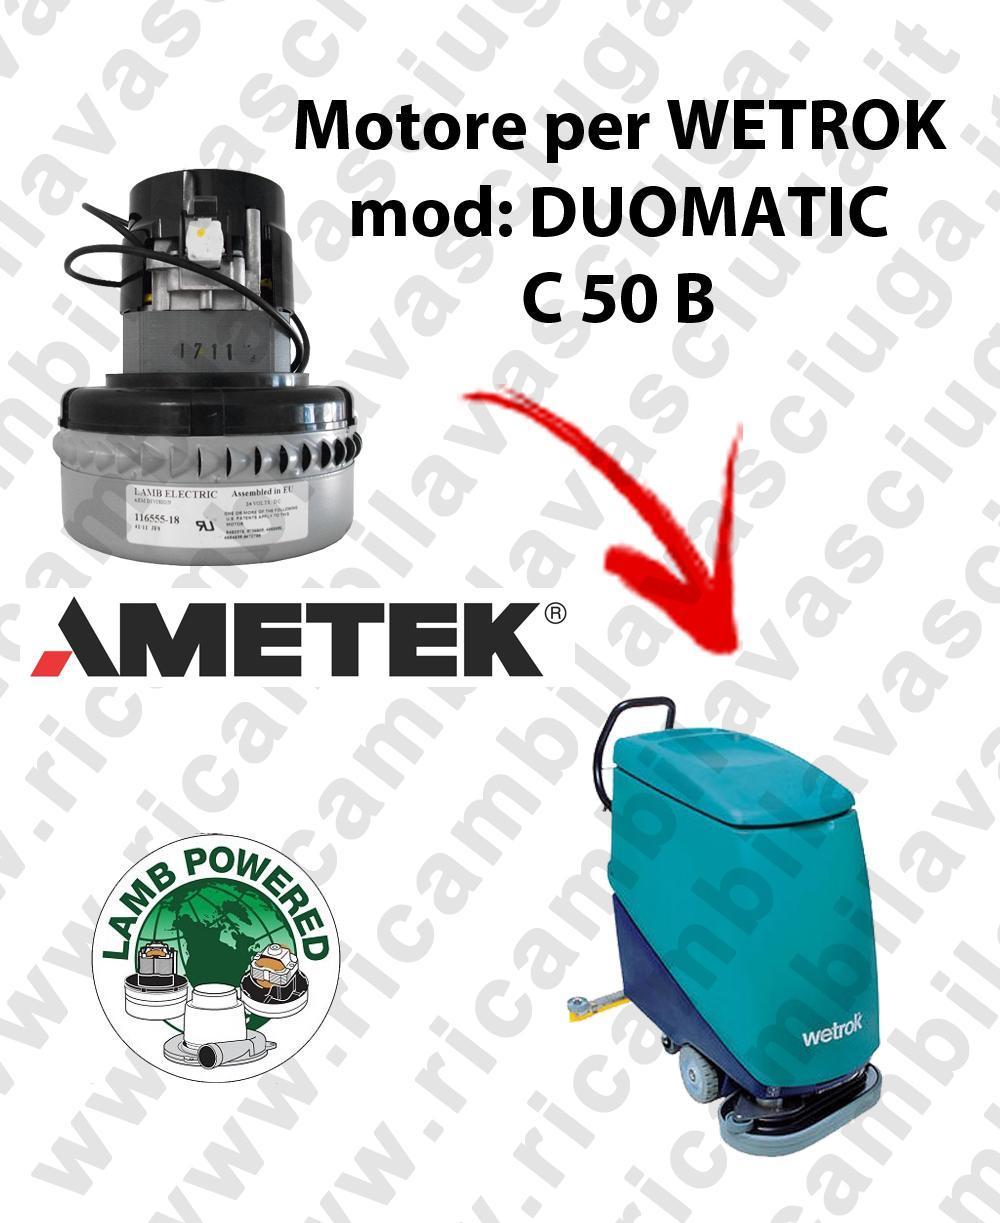 DUOMATIC C 50 B Motore de aspiración LAMB AMETEK para fregadora WETROK